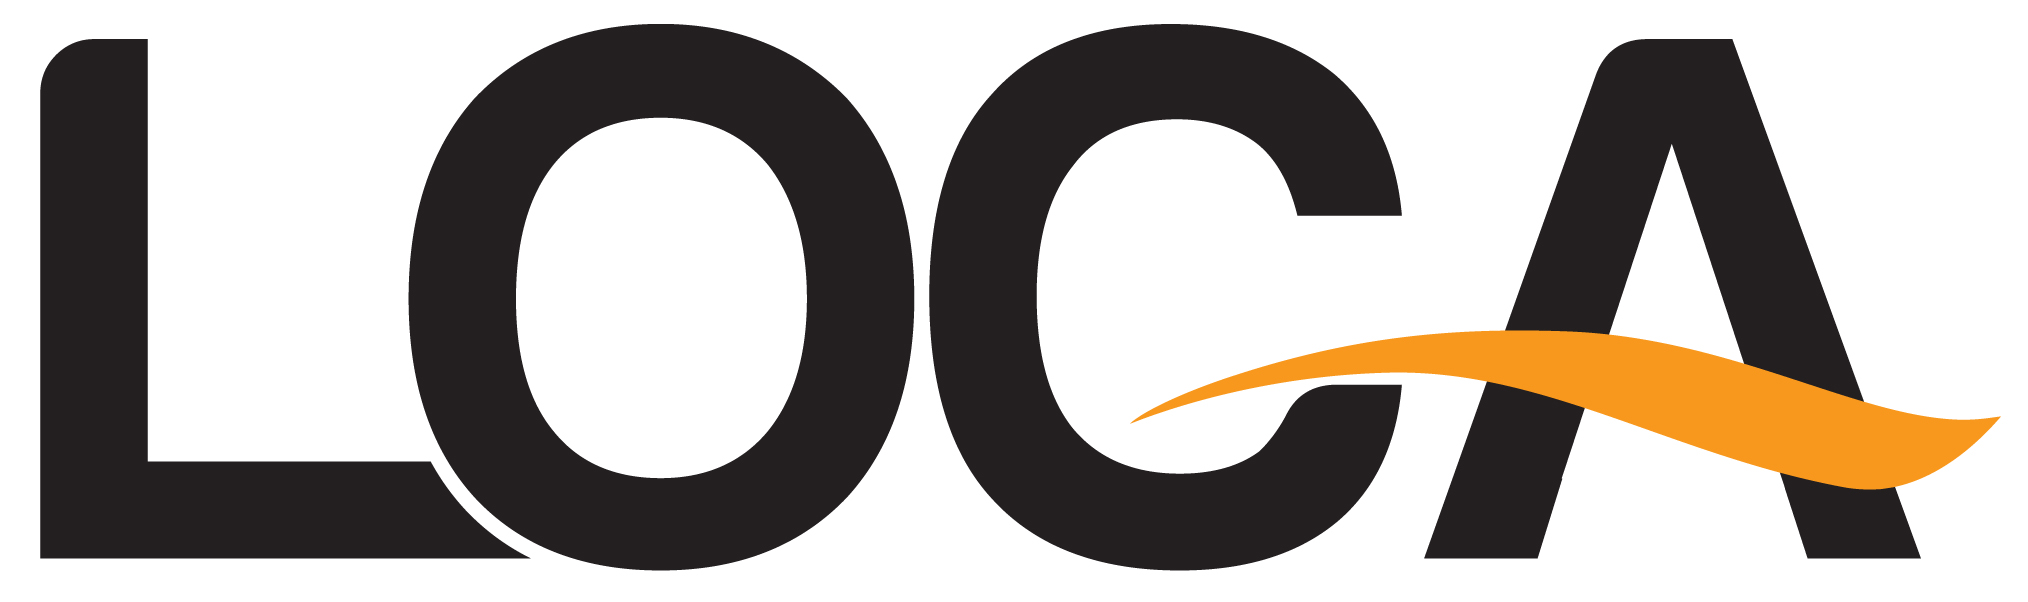 Loca_logo_slogan